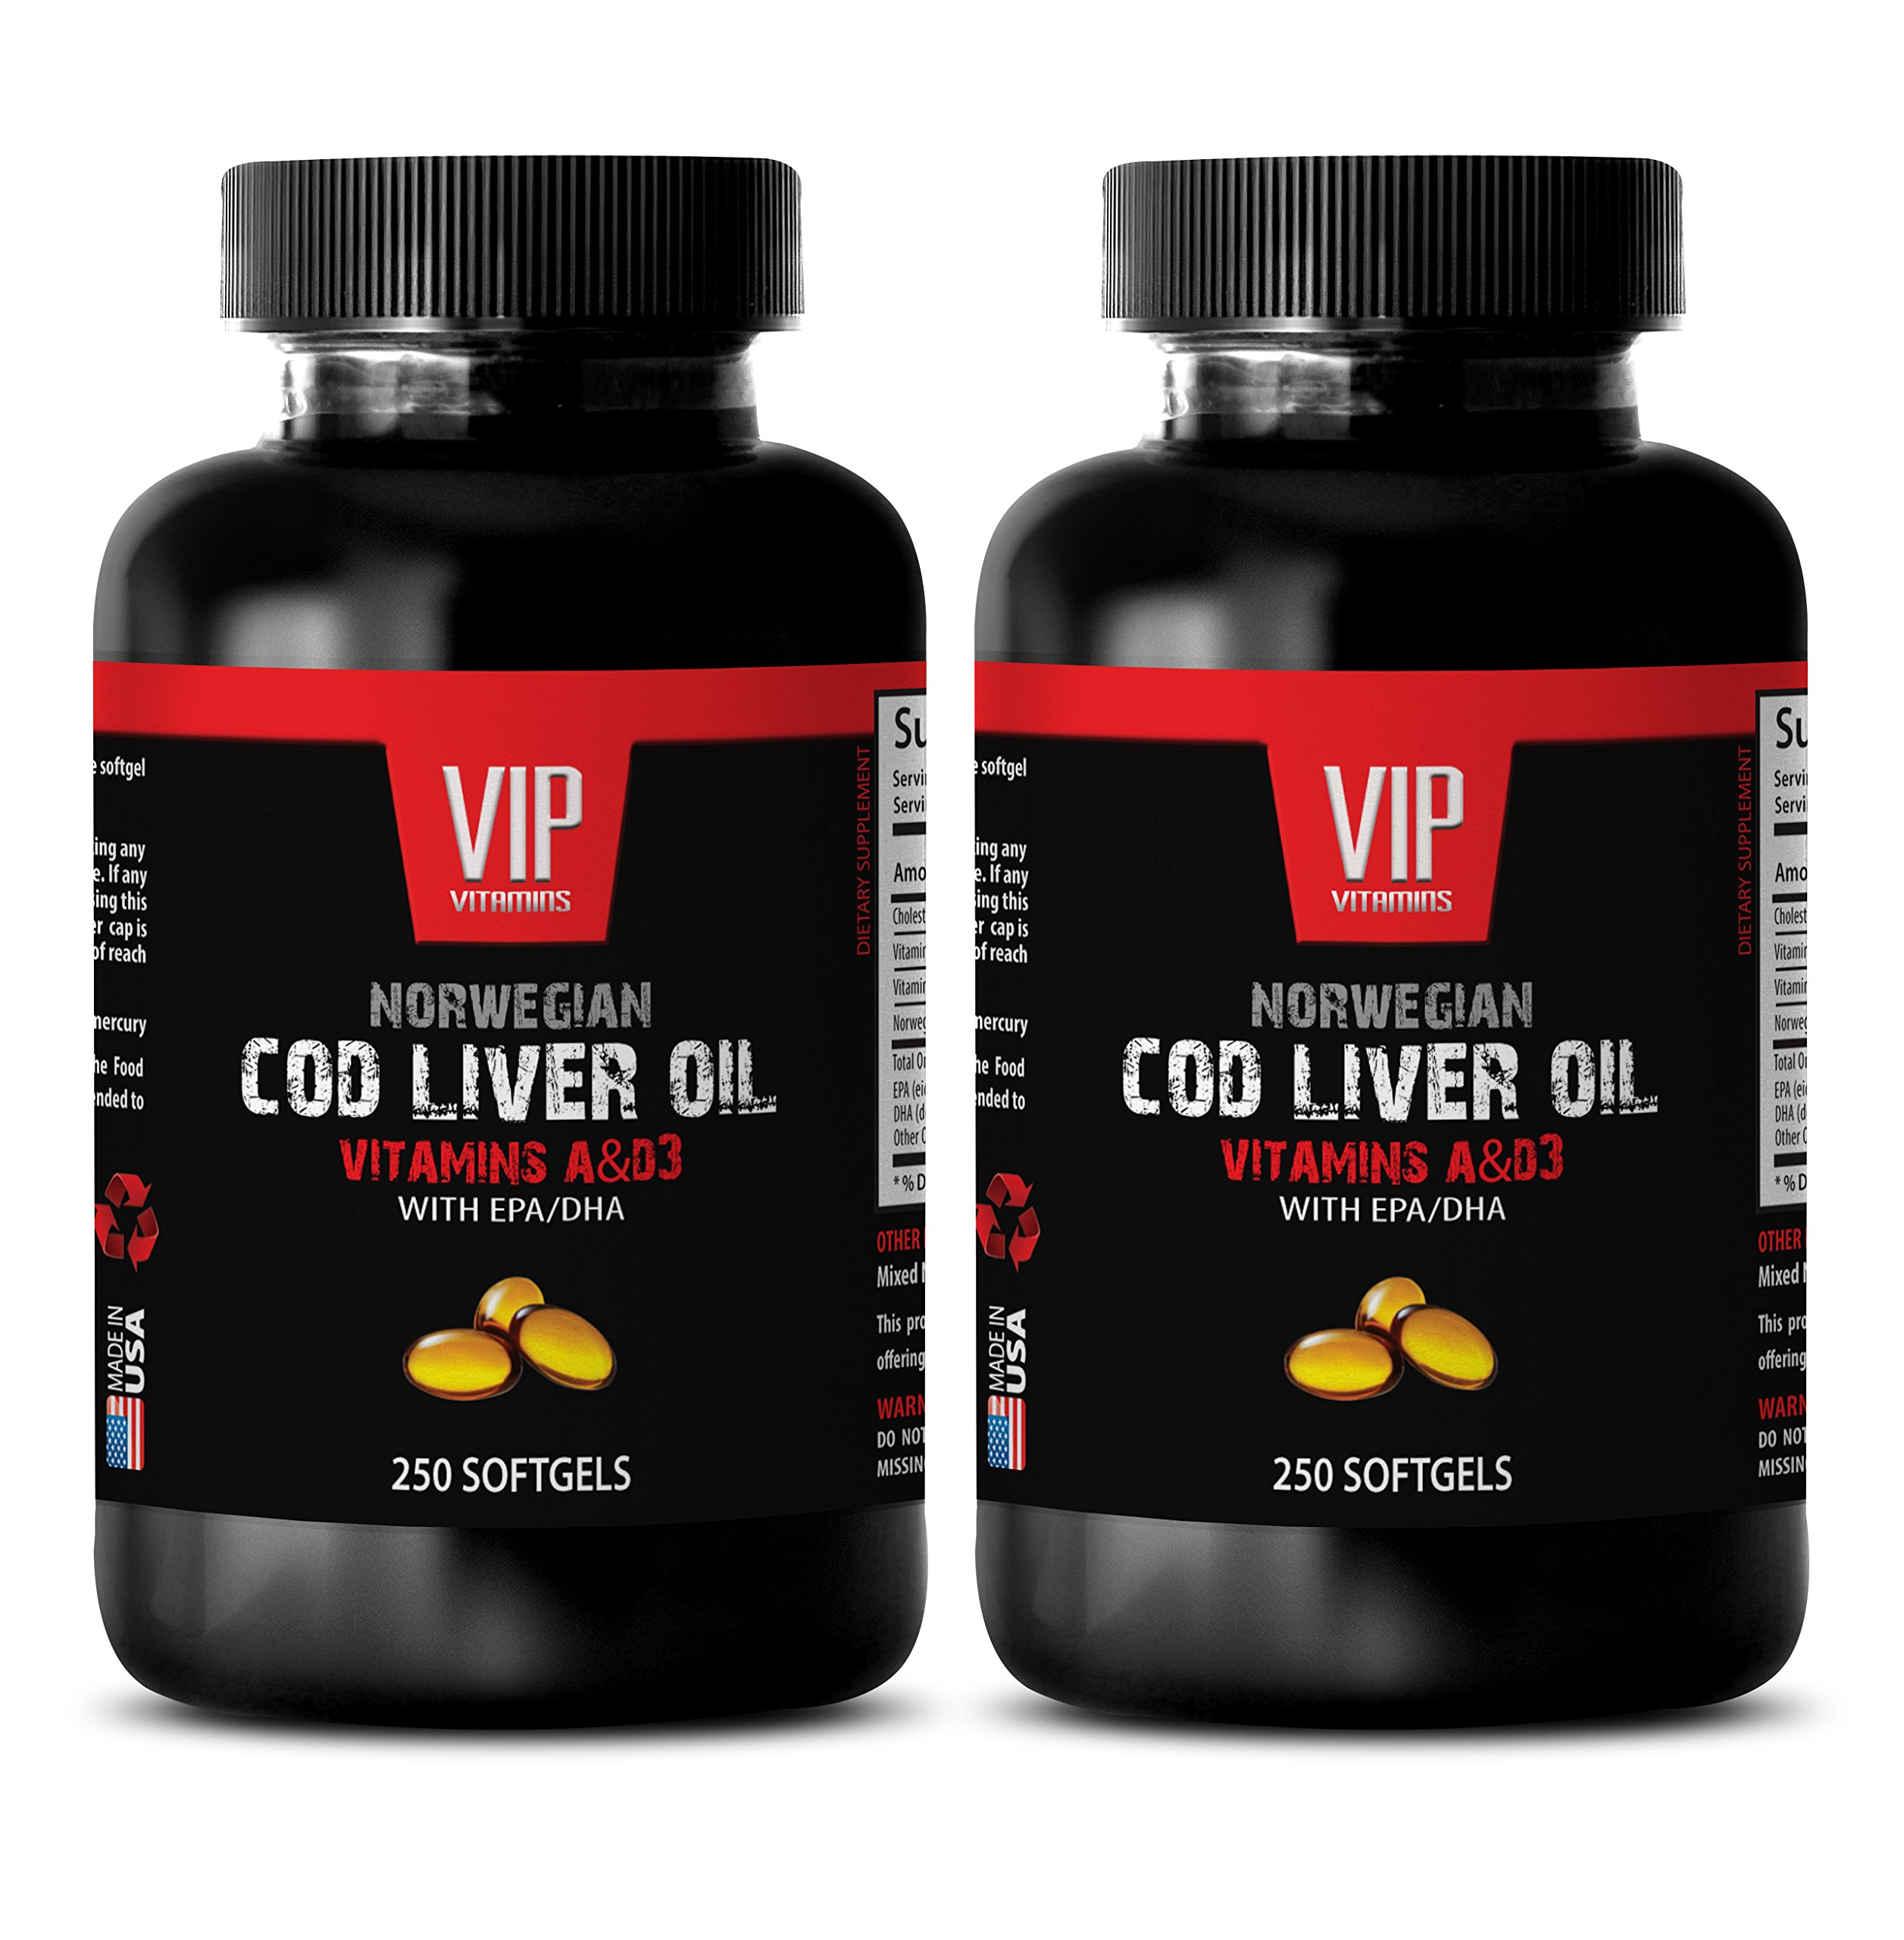 NORWEGIAN COD LIVER OIL with Vitamins A & D3/EPA & DHA - Mental wellness - 2 Bottles 500 Softgels